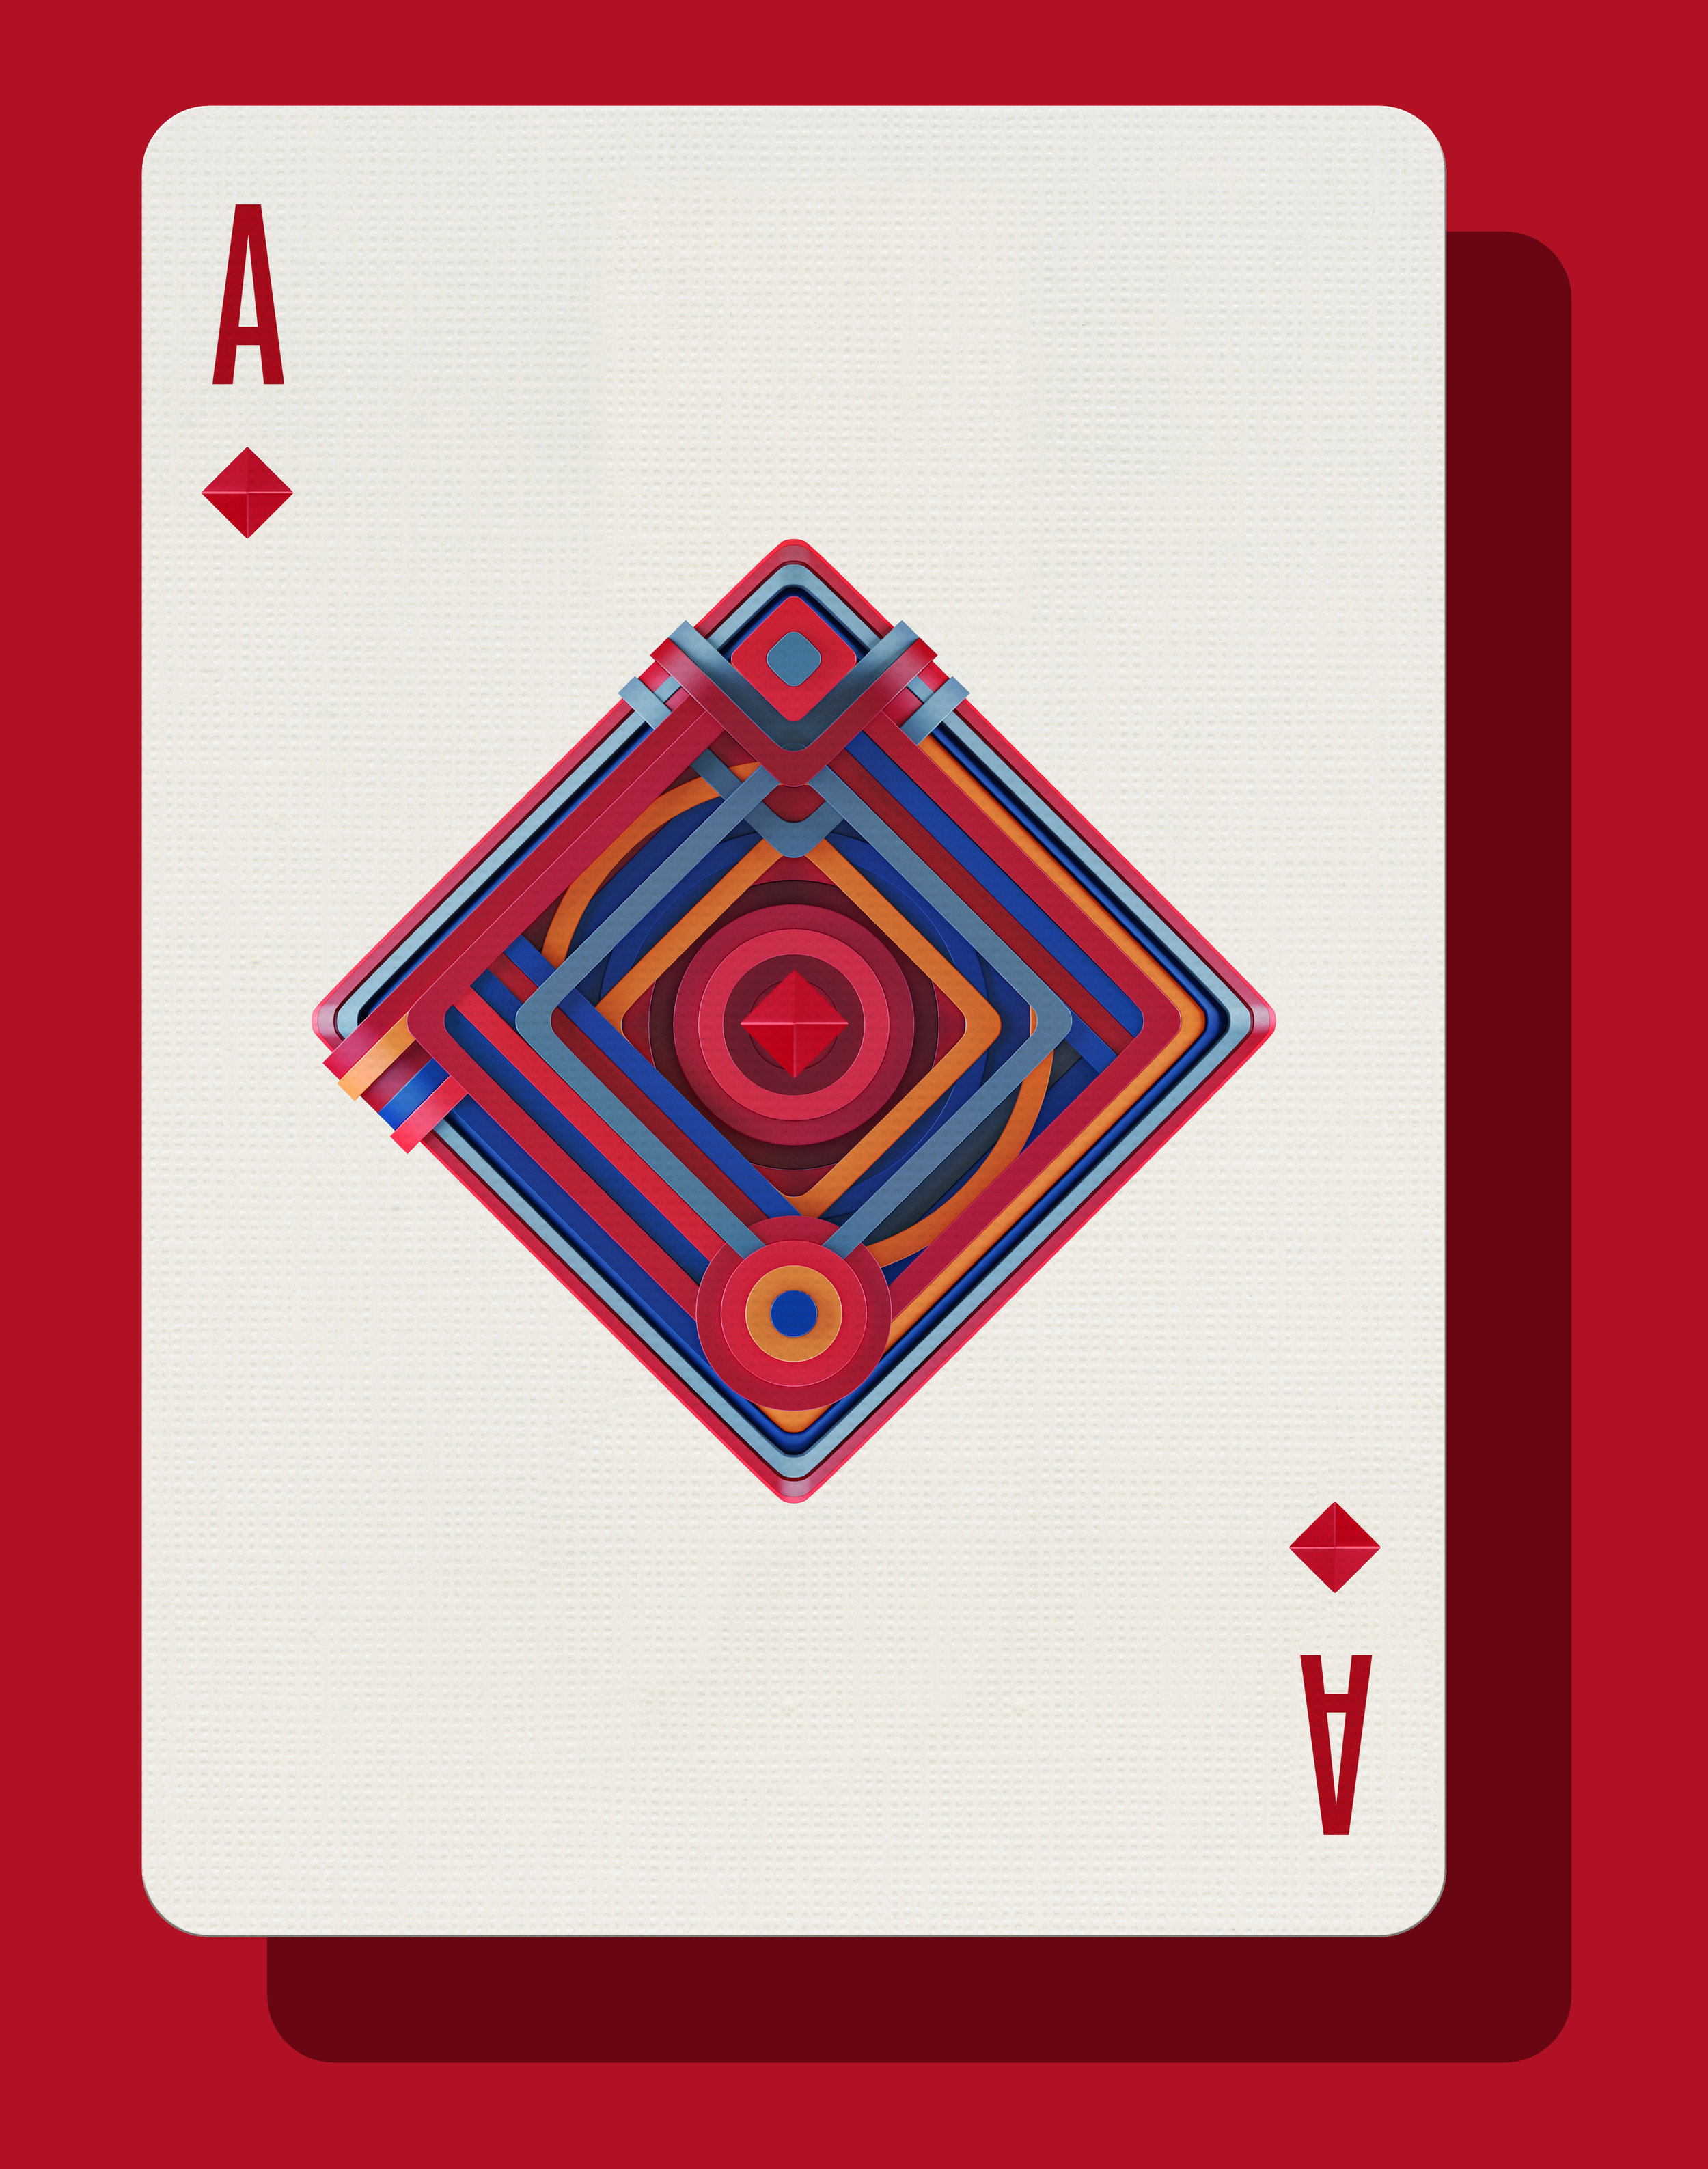 ACE_diamonds.jpg